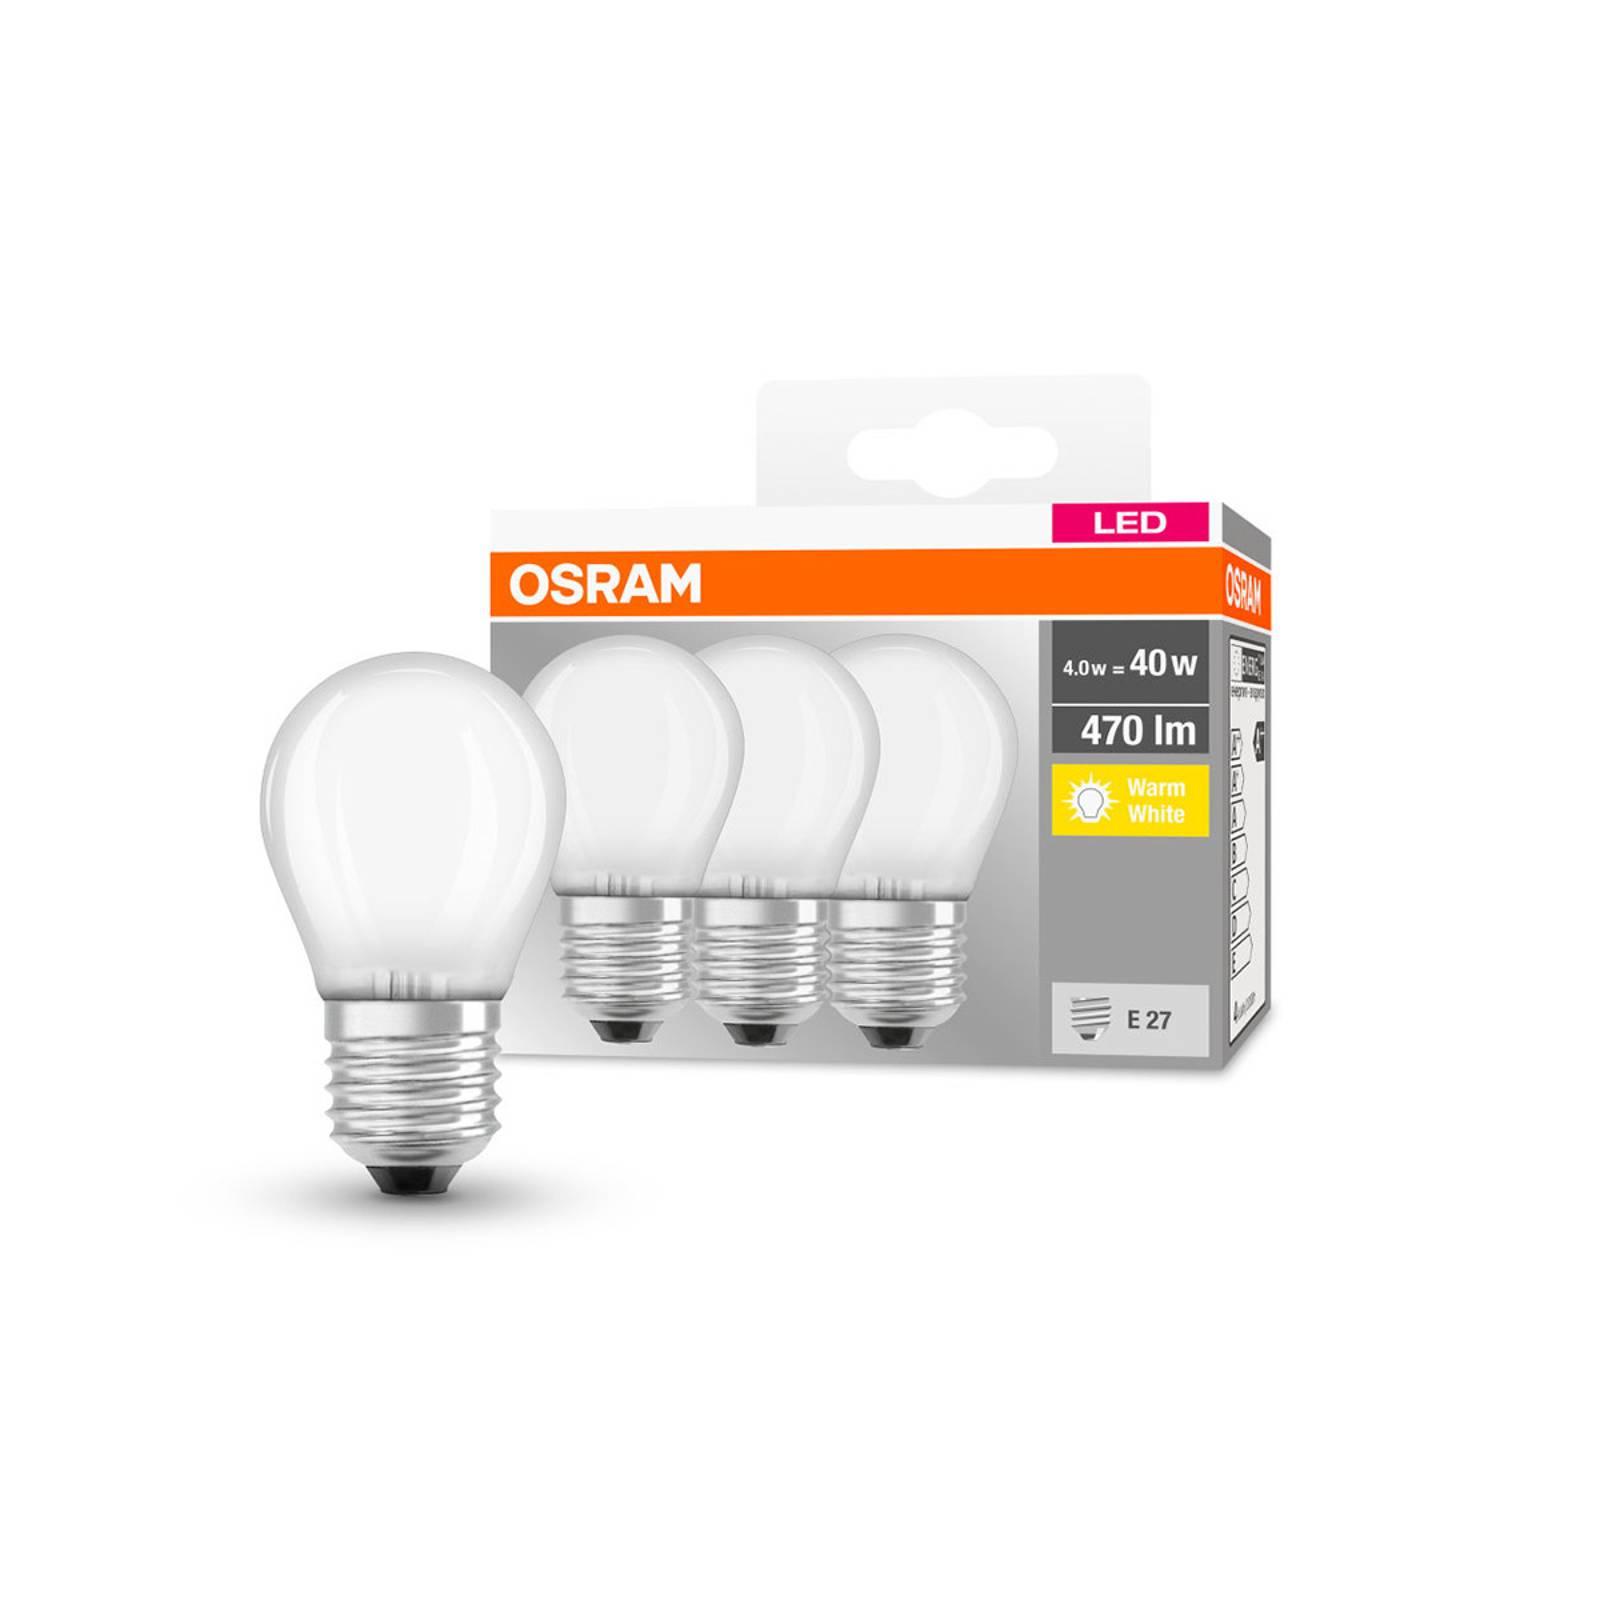 OSRAM-LED-pisara E27 P40 4W 2700K 470lm matta, 3